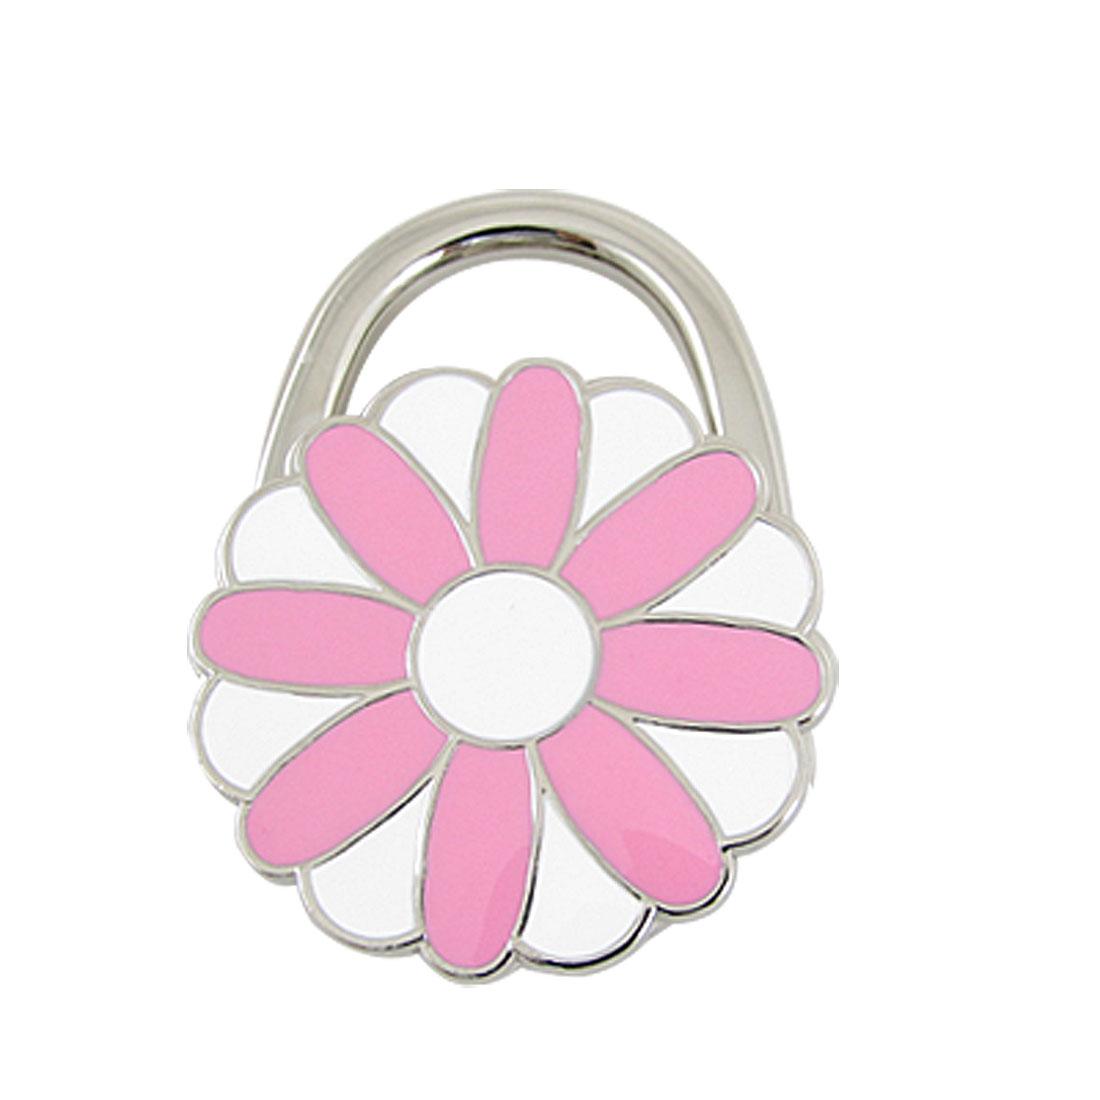 Pink White Chrysanthemum Non-skid Rubber Bag Purse Handbag Hook Hanger Holder